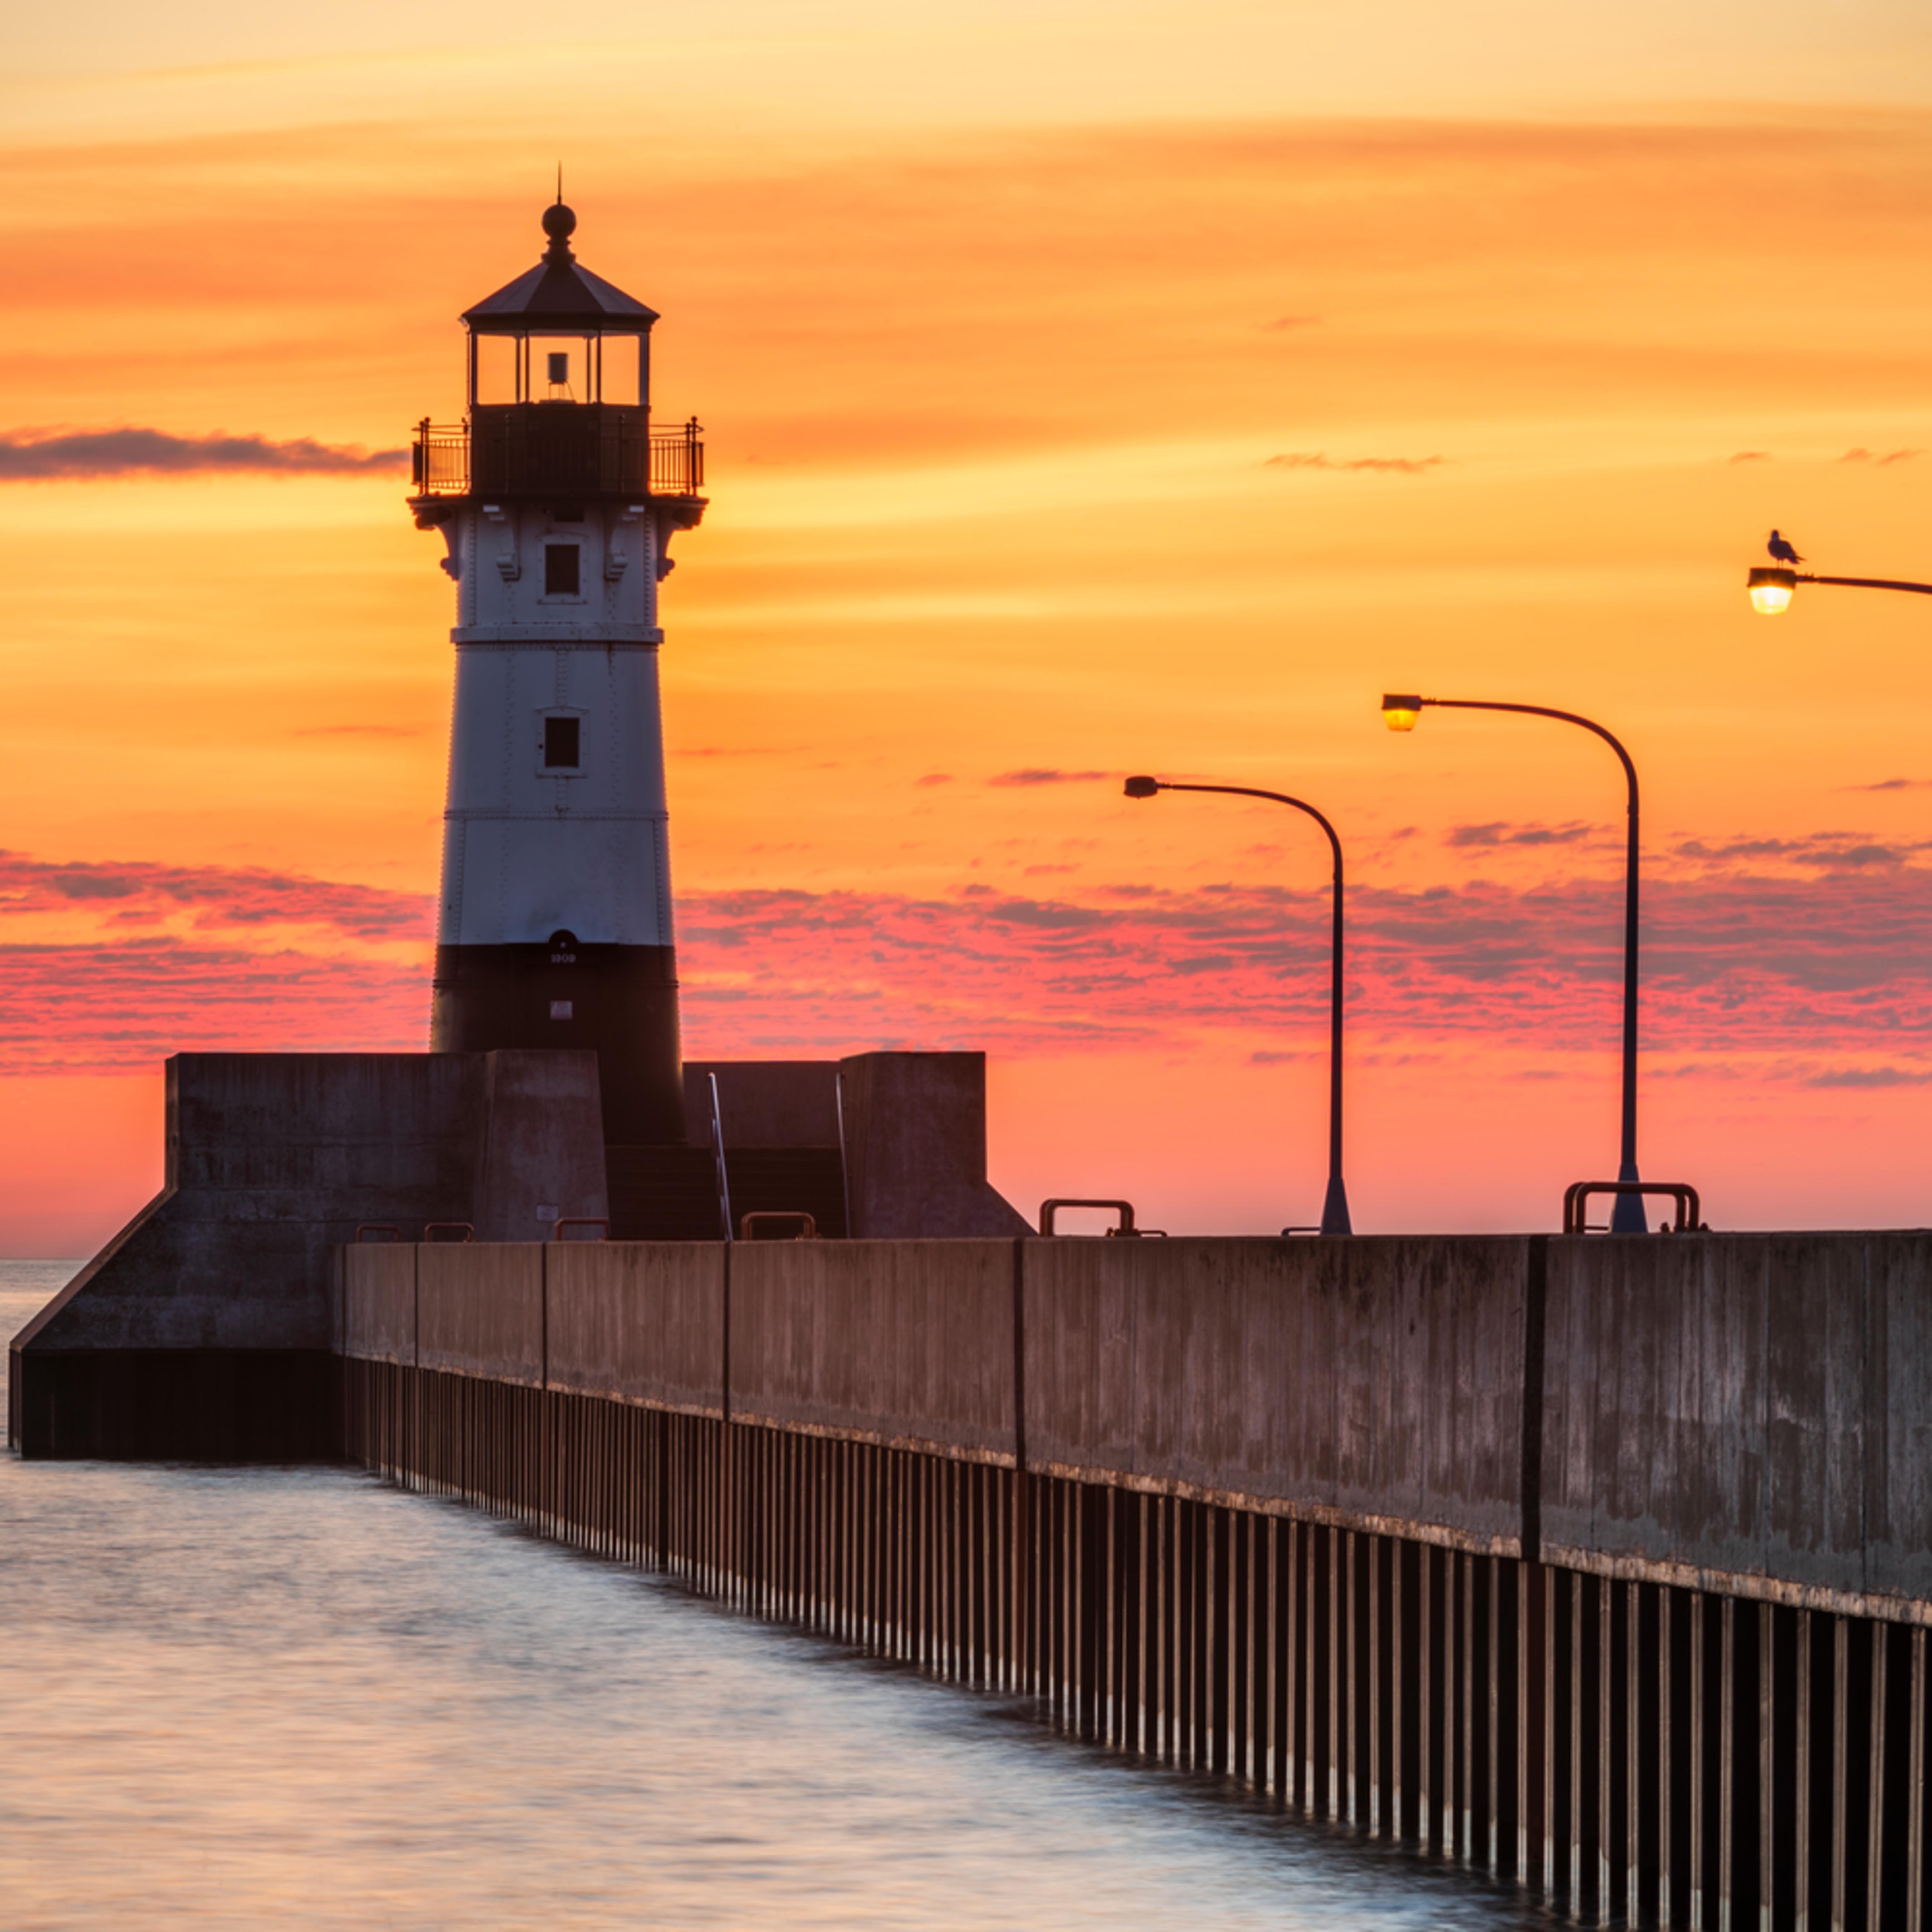 North pier sunrise v8exqr